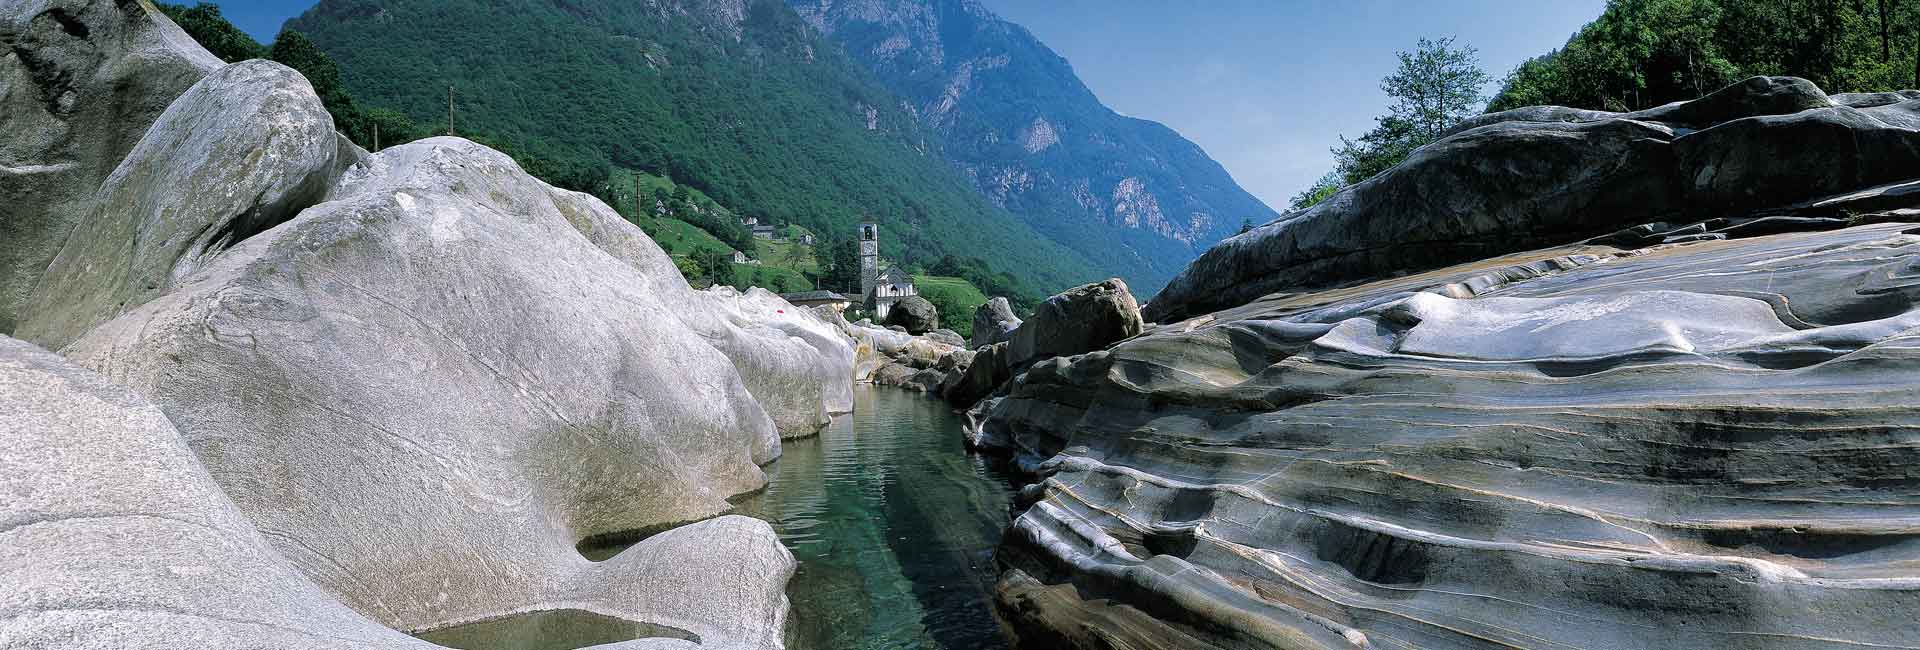 Reiseziel Tessin Berge